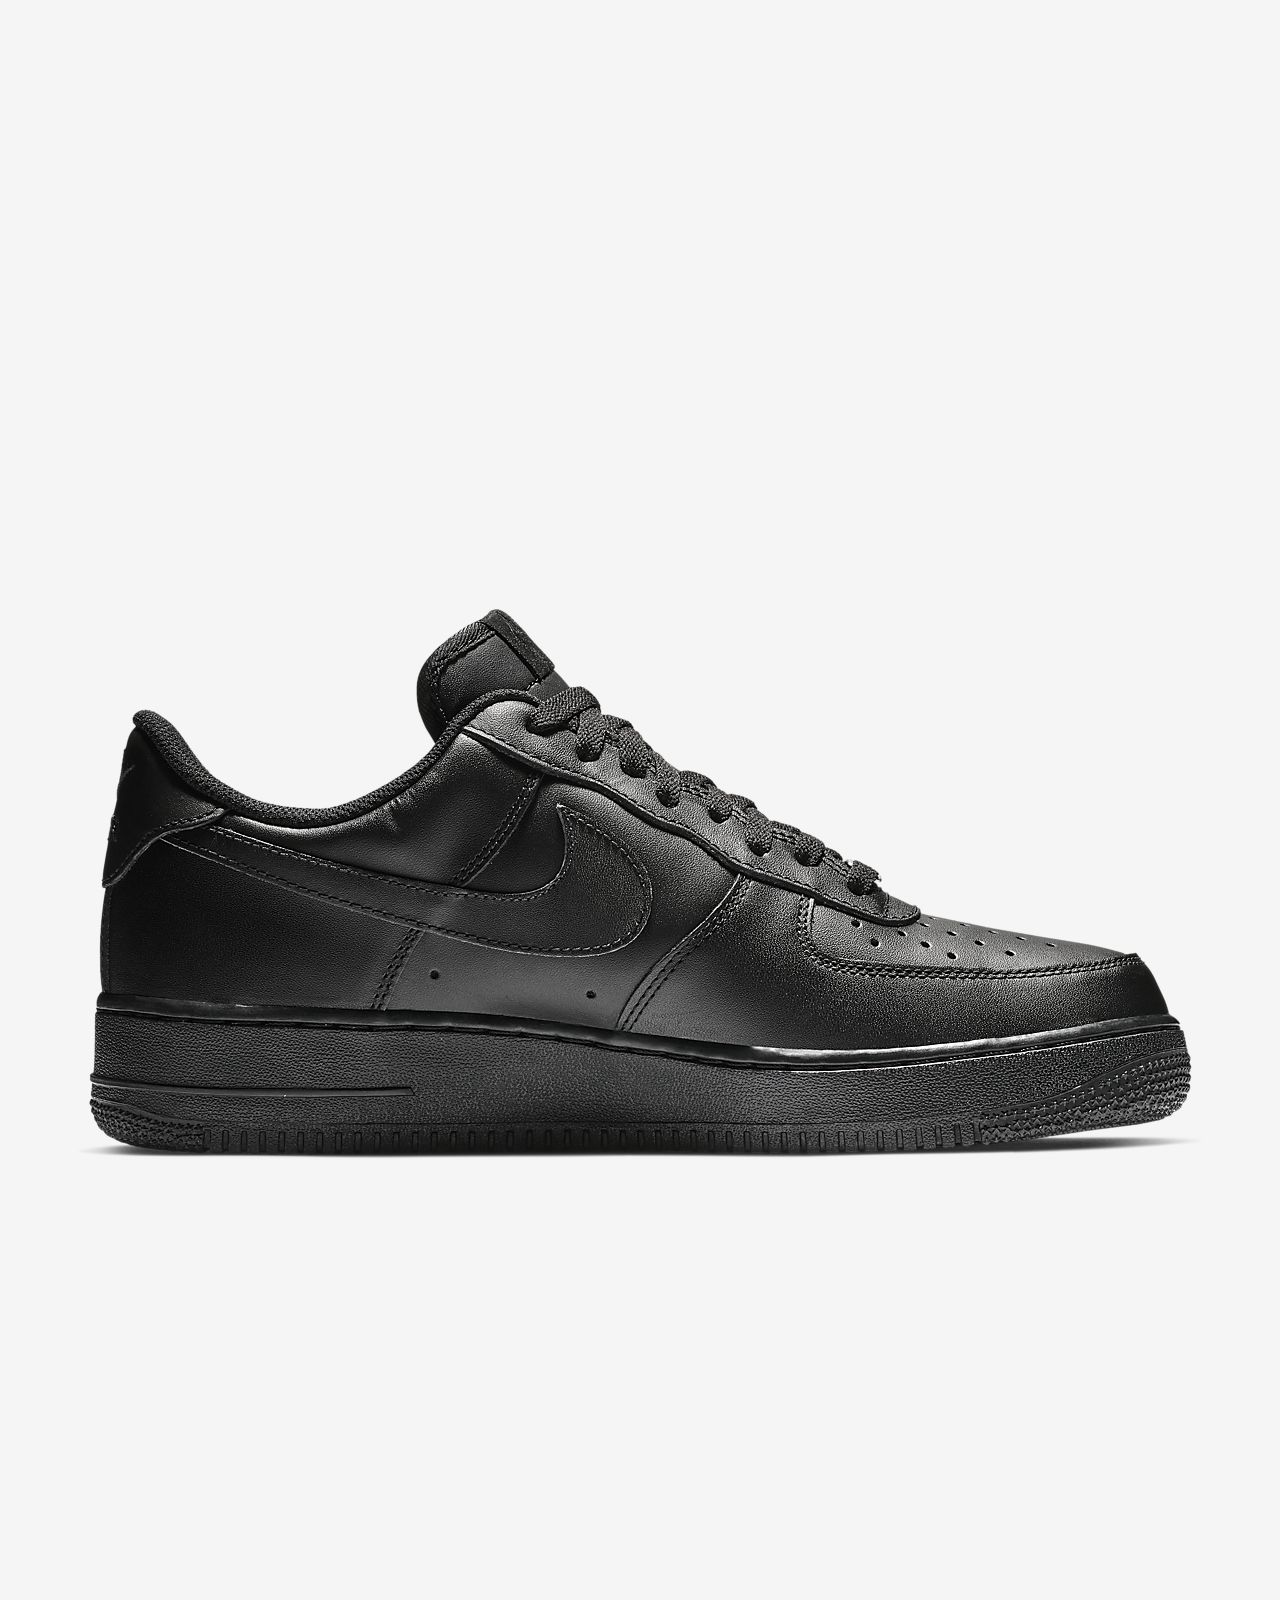 newest af8aa b66ac Nike Air Force 1 '07 Men's Shoe. Nike.com FI